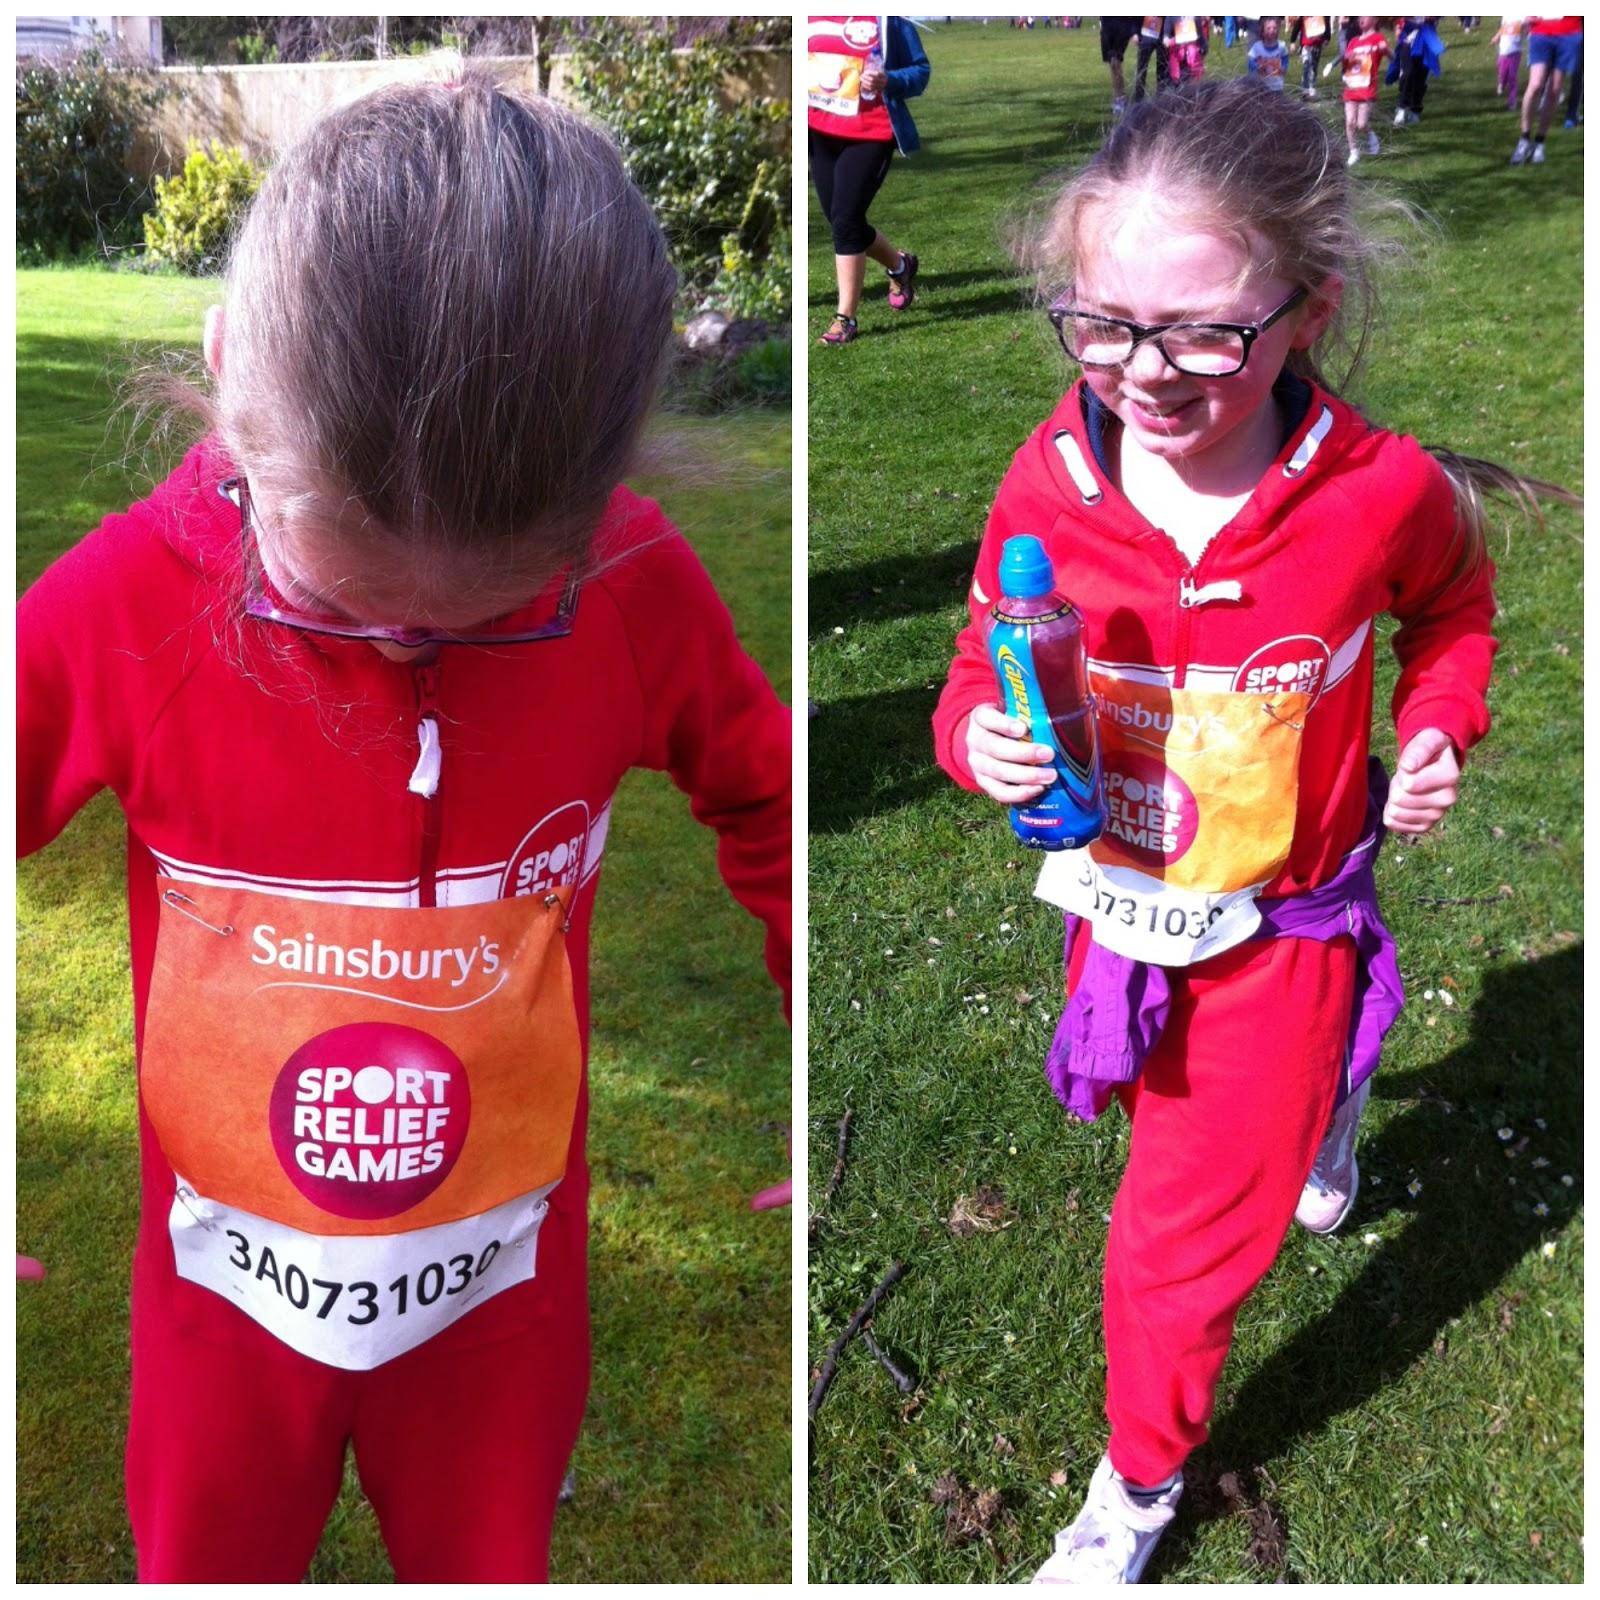 Sport-Relief-daughter-running-charity